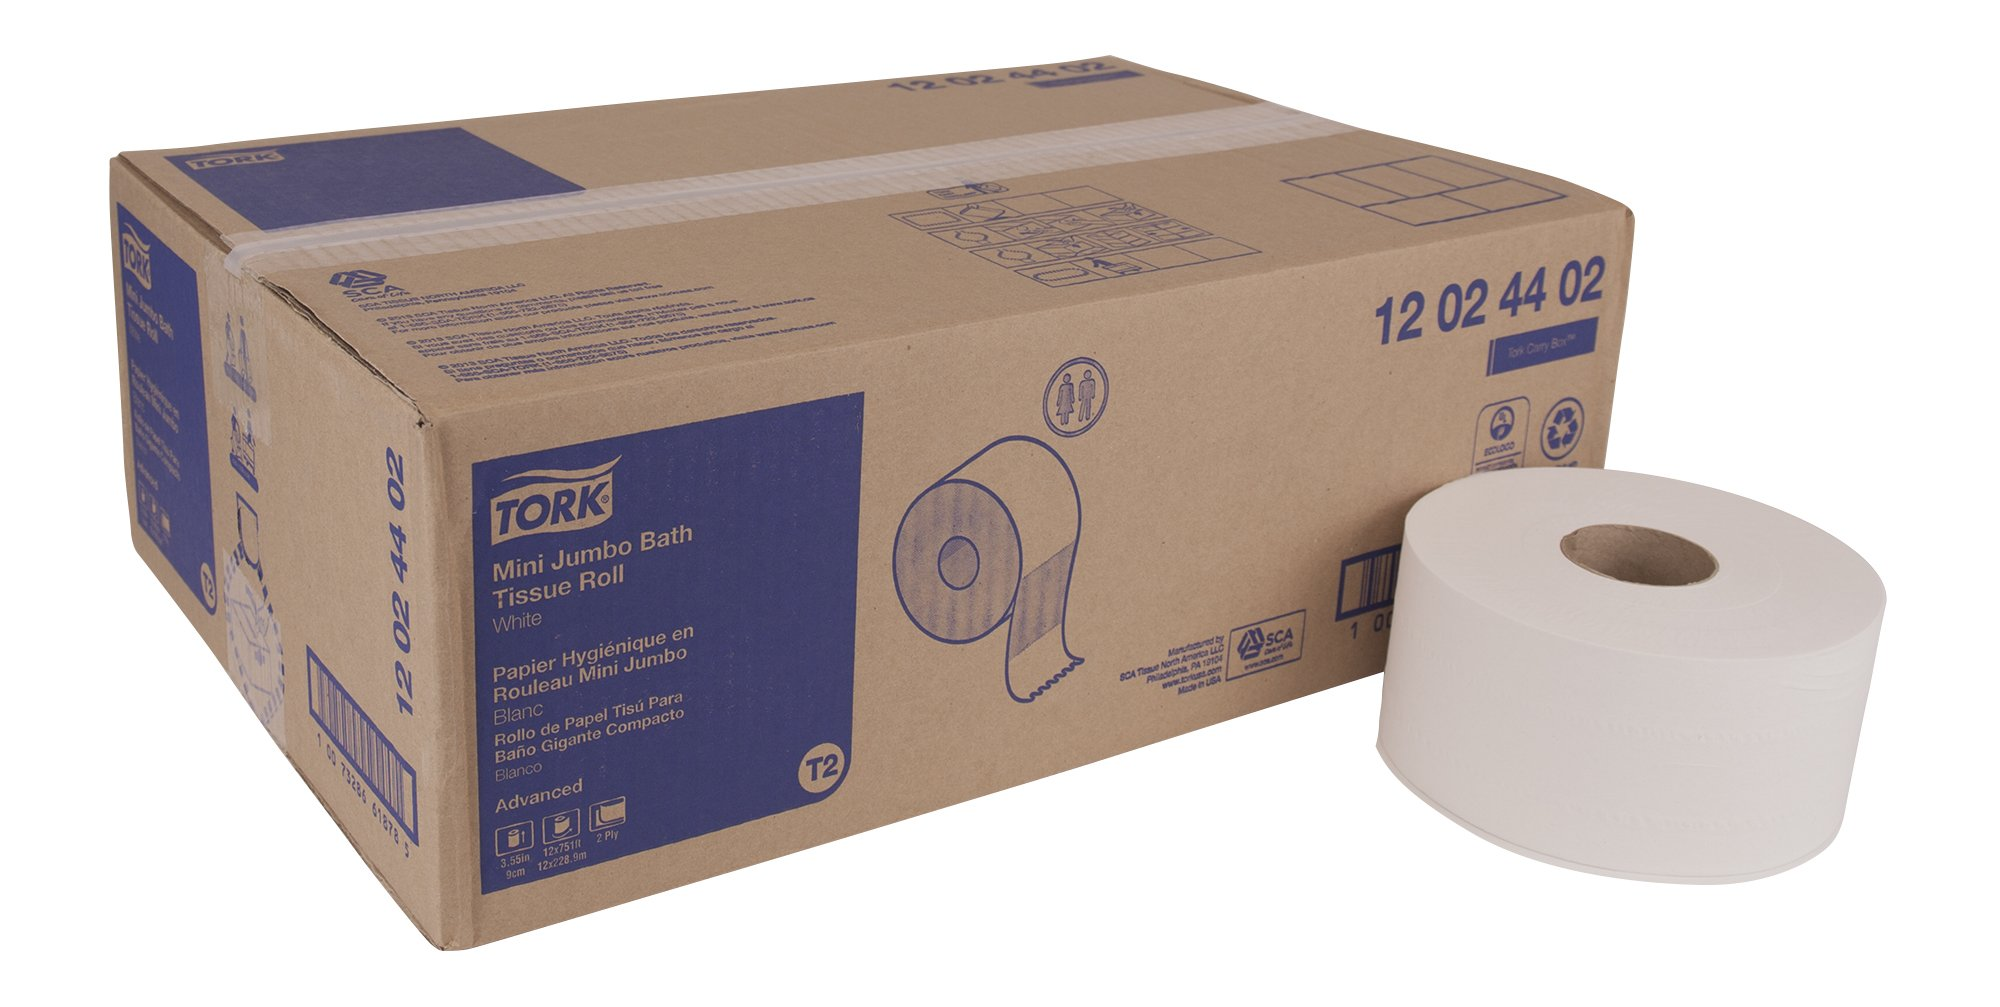 Tork Advanced 12024402 Mini Jumbo Bath Tissue Roll, 2-Ply, 7.36'' Diameter, 3.55'' Width x 751' Length, White (Case of 12 Rolls, 751' per Roll, 9,012 Feet)